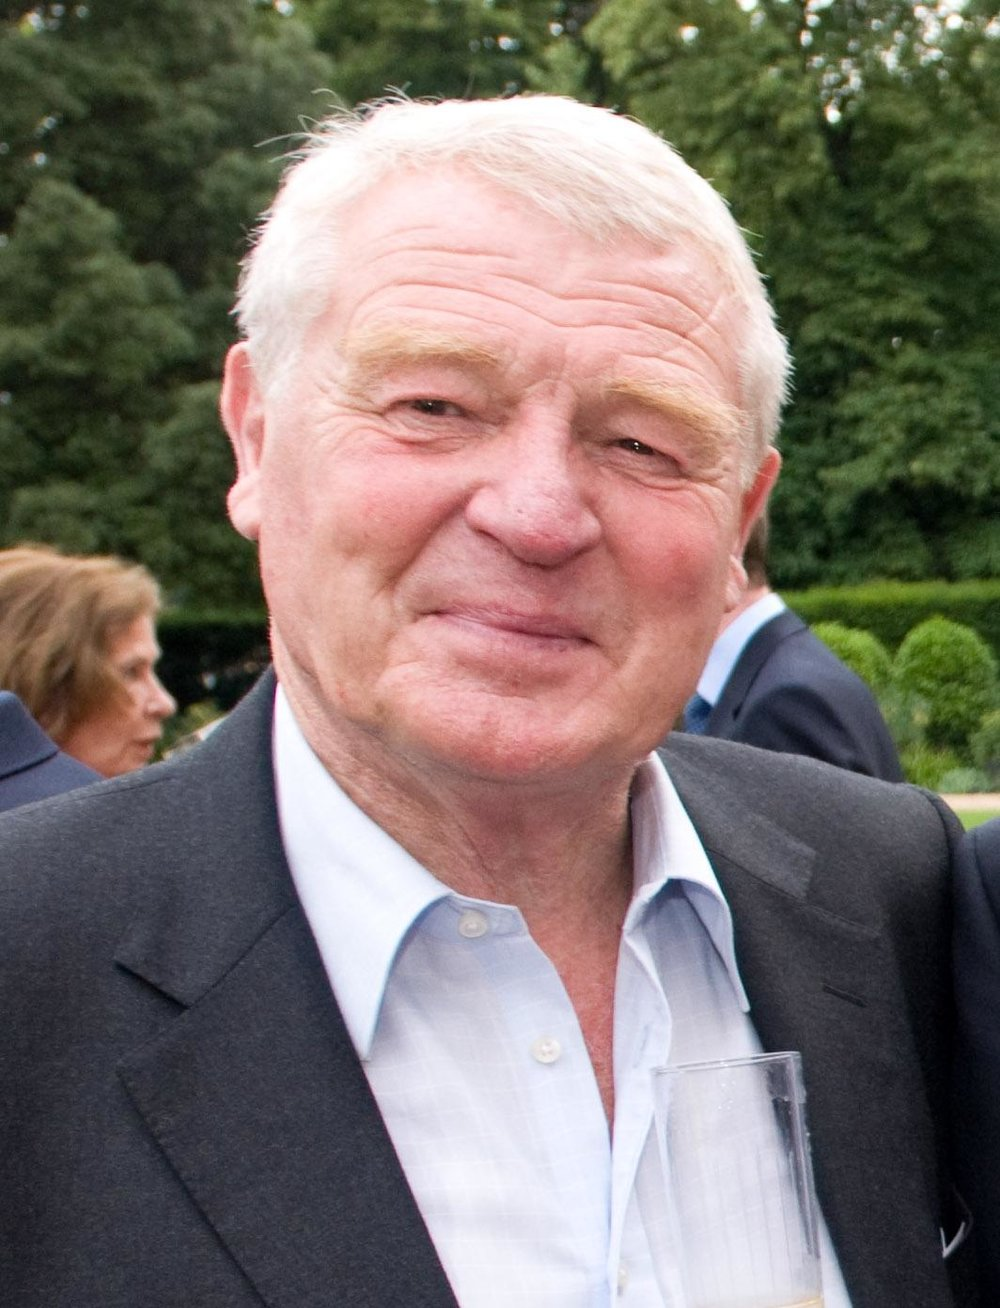 Lord (Paddy) Ashdown